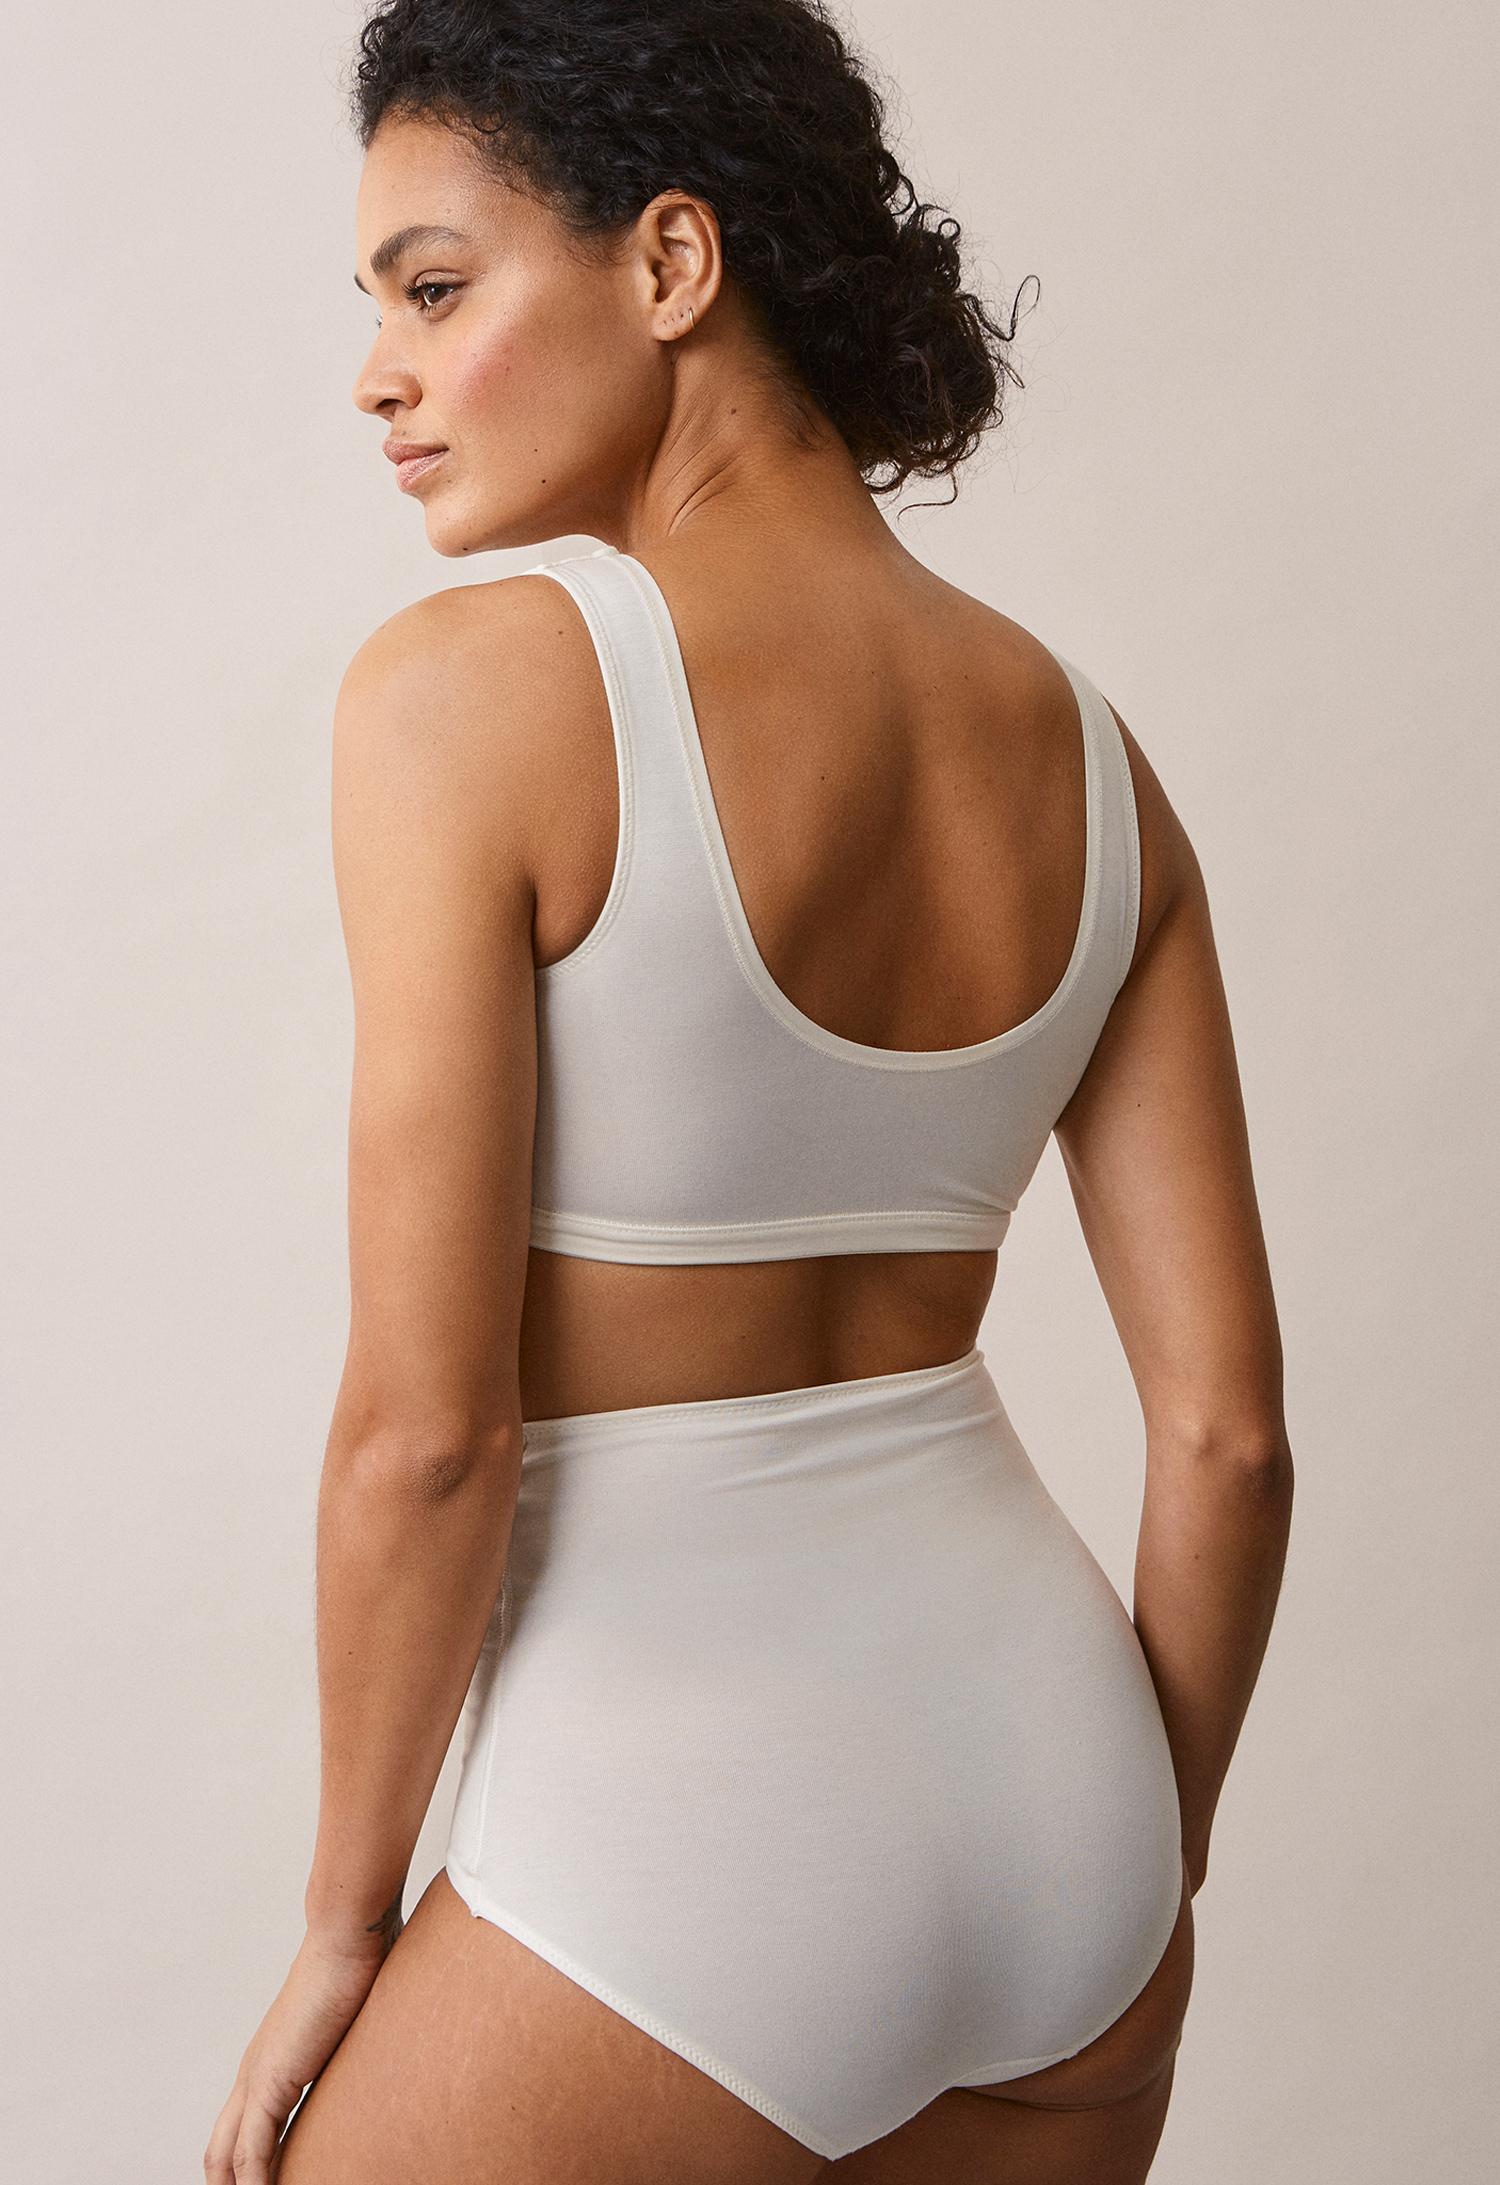 24/7 bratofu (3) - Maternity underwear / Nursing underwear